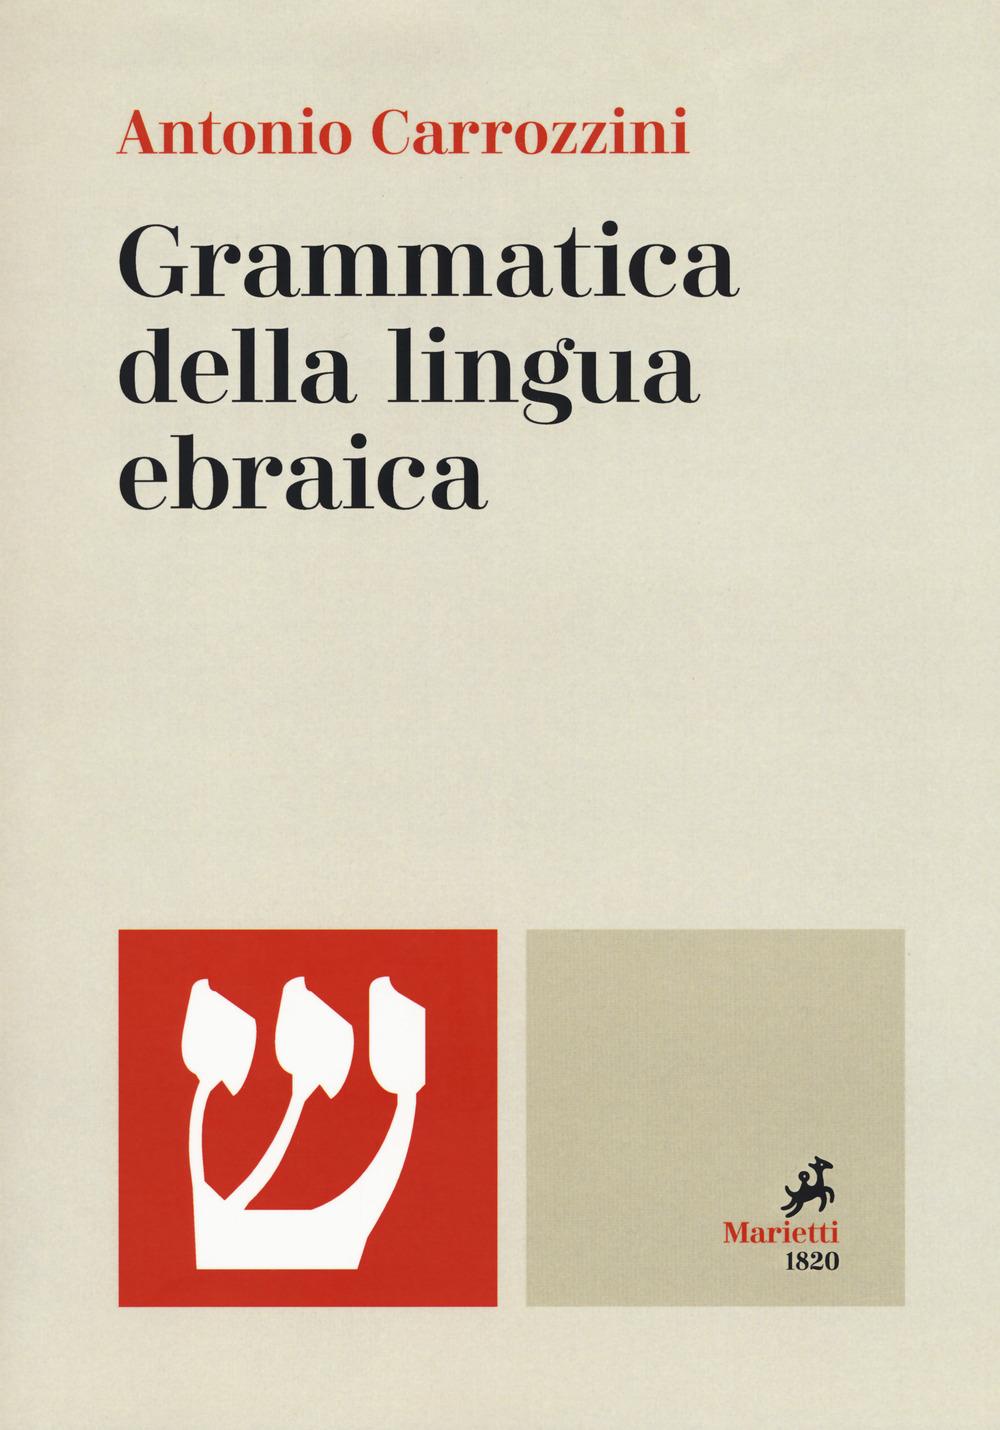 Grammatica della lingua ebraica. Ediz. bilingue